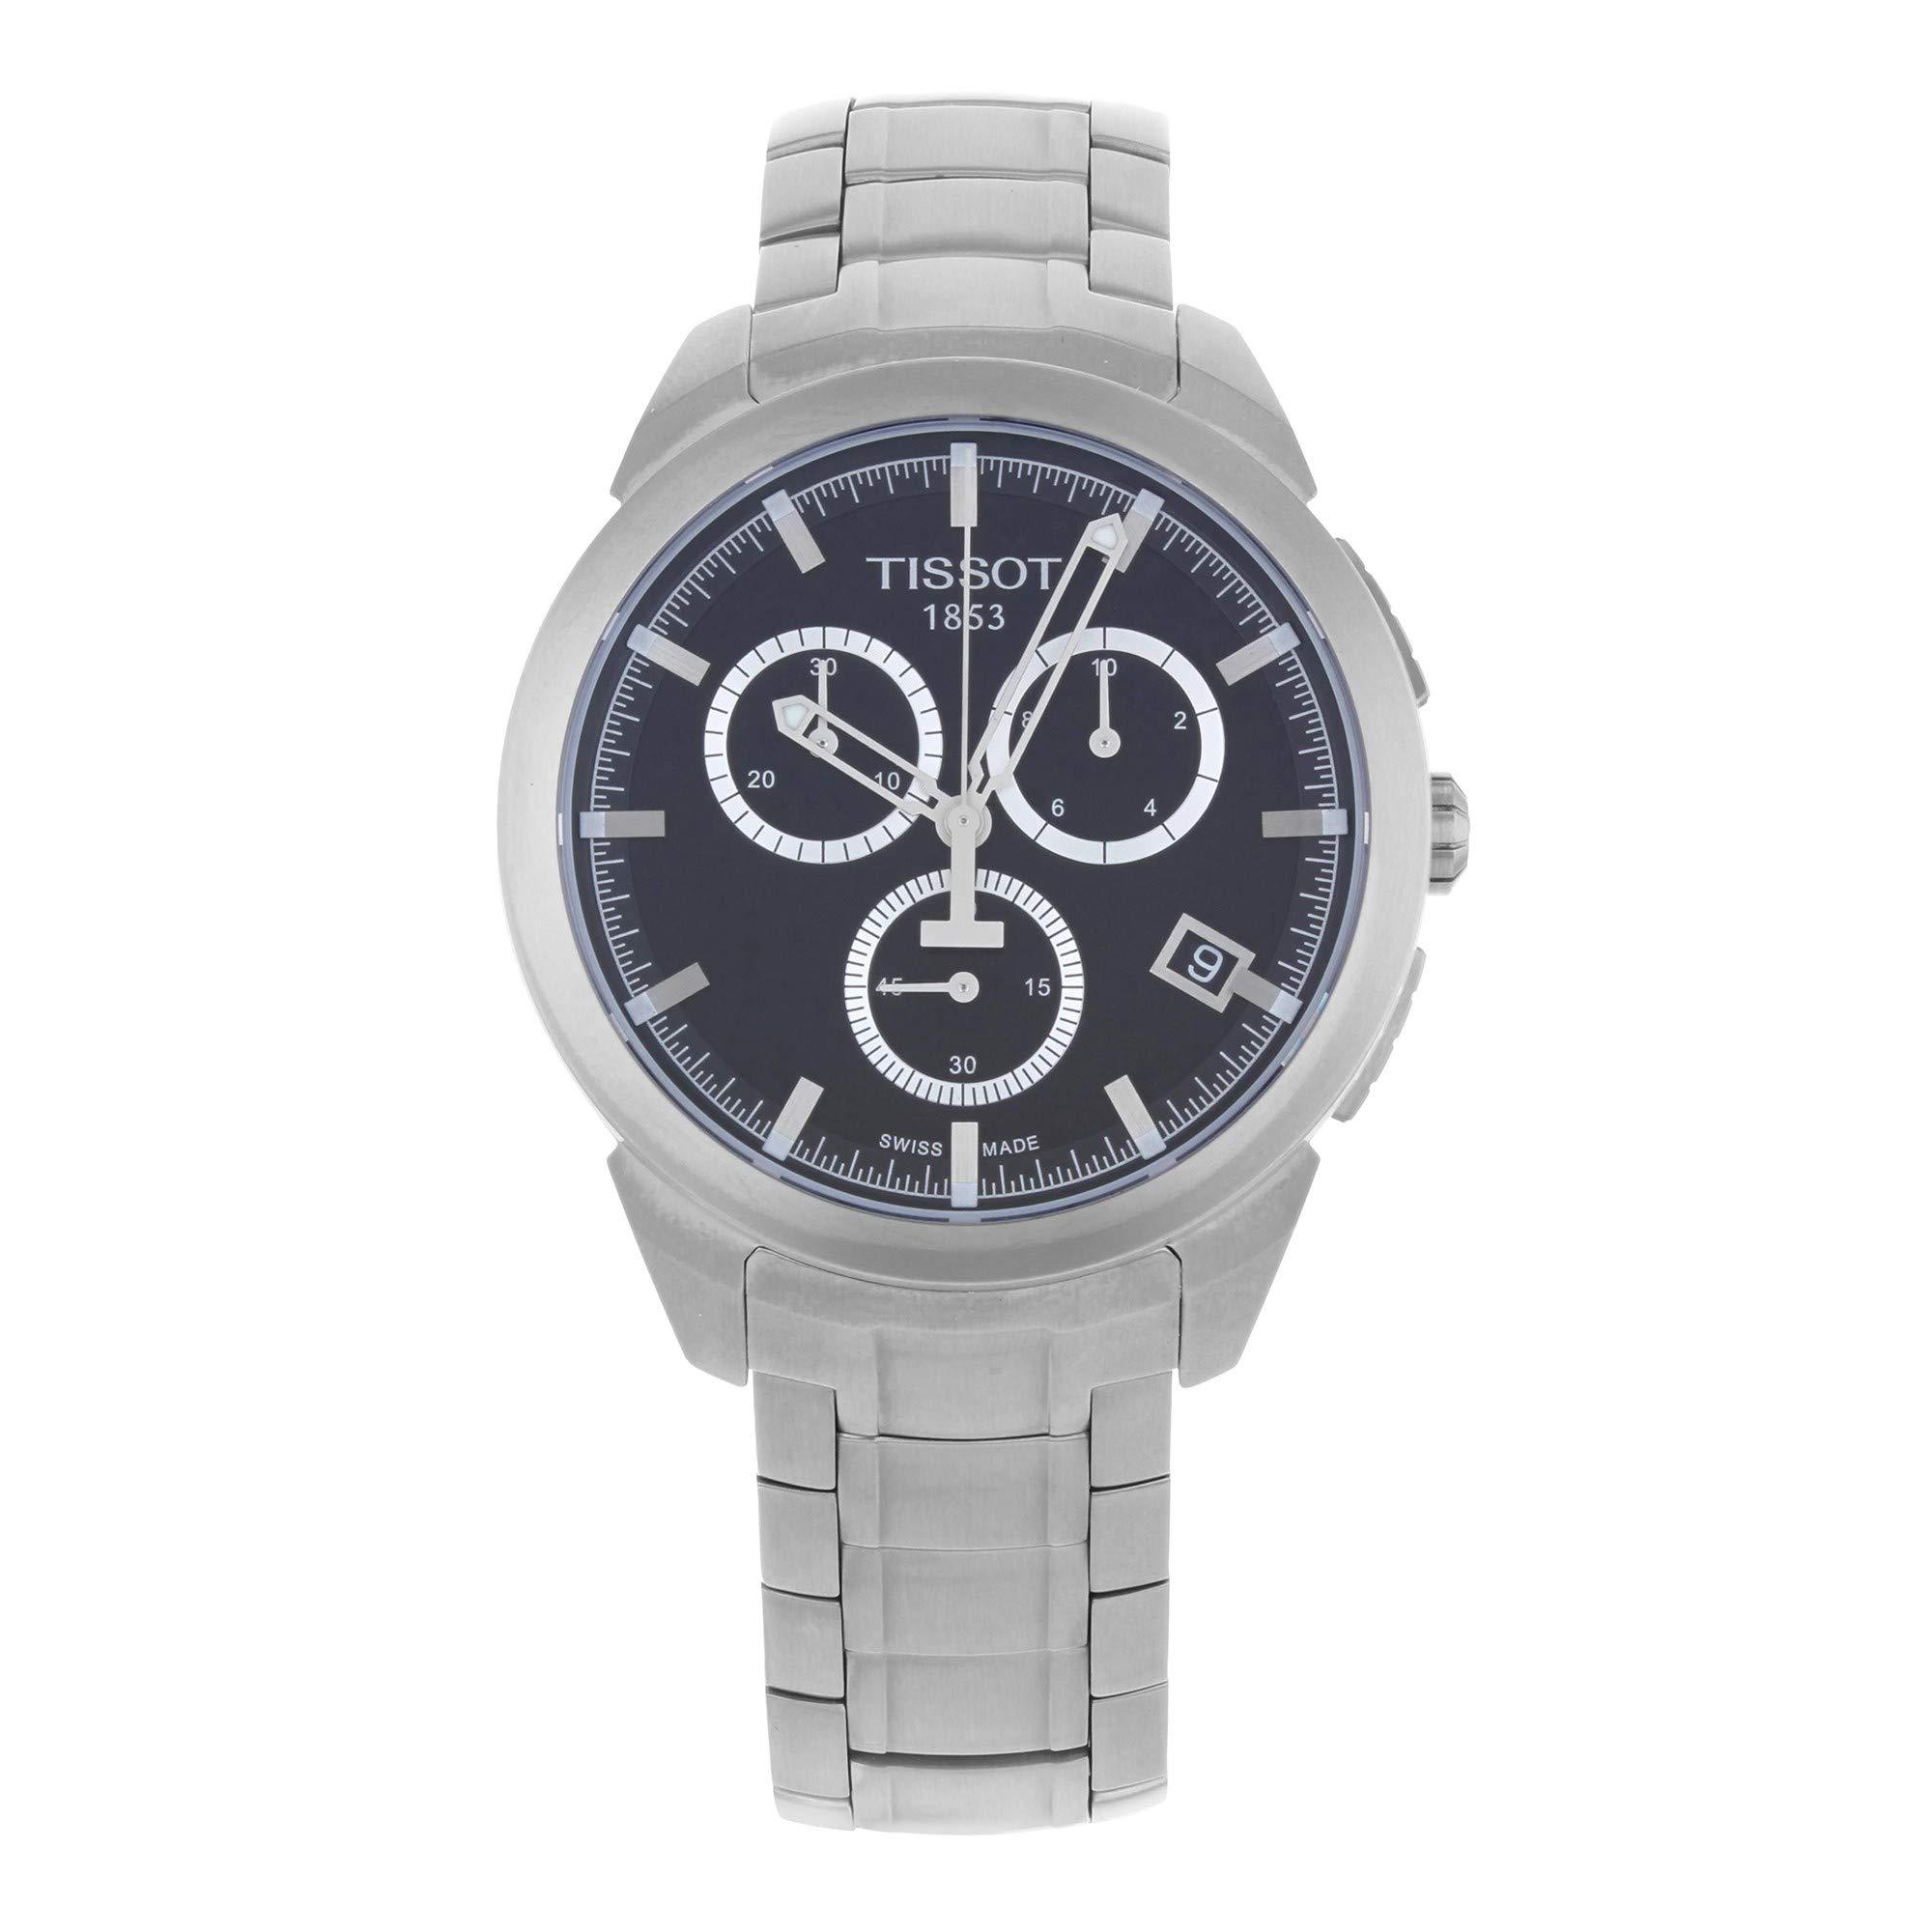 Mathey-Tissot T-Sport Quartz Male Watch T069.417.44.051.00 (Certified Pre-Owned)